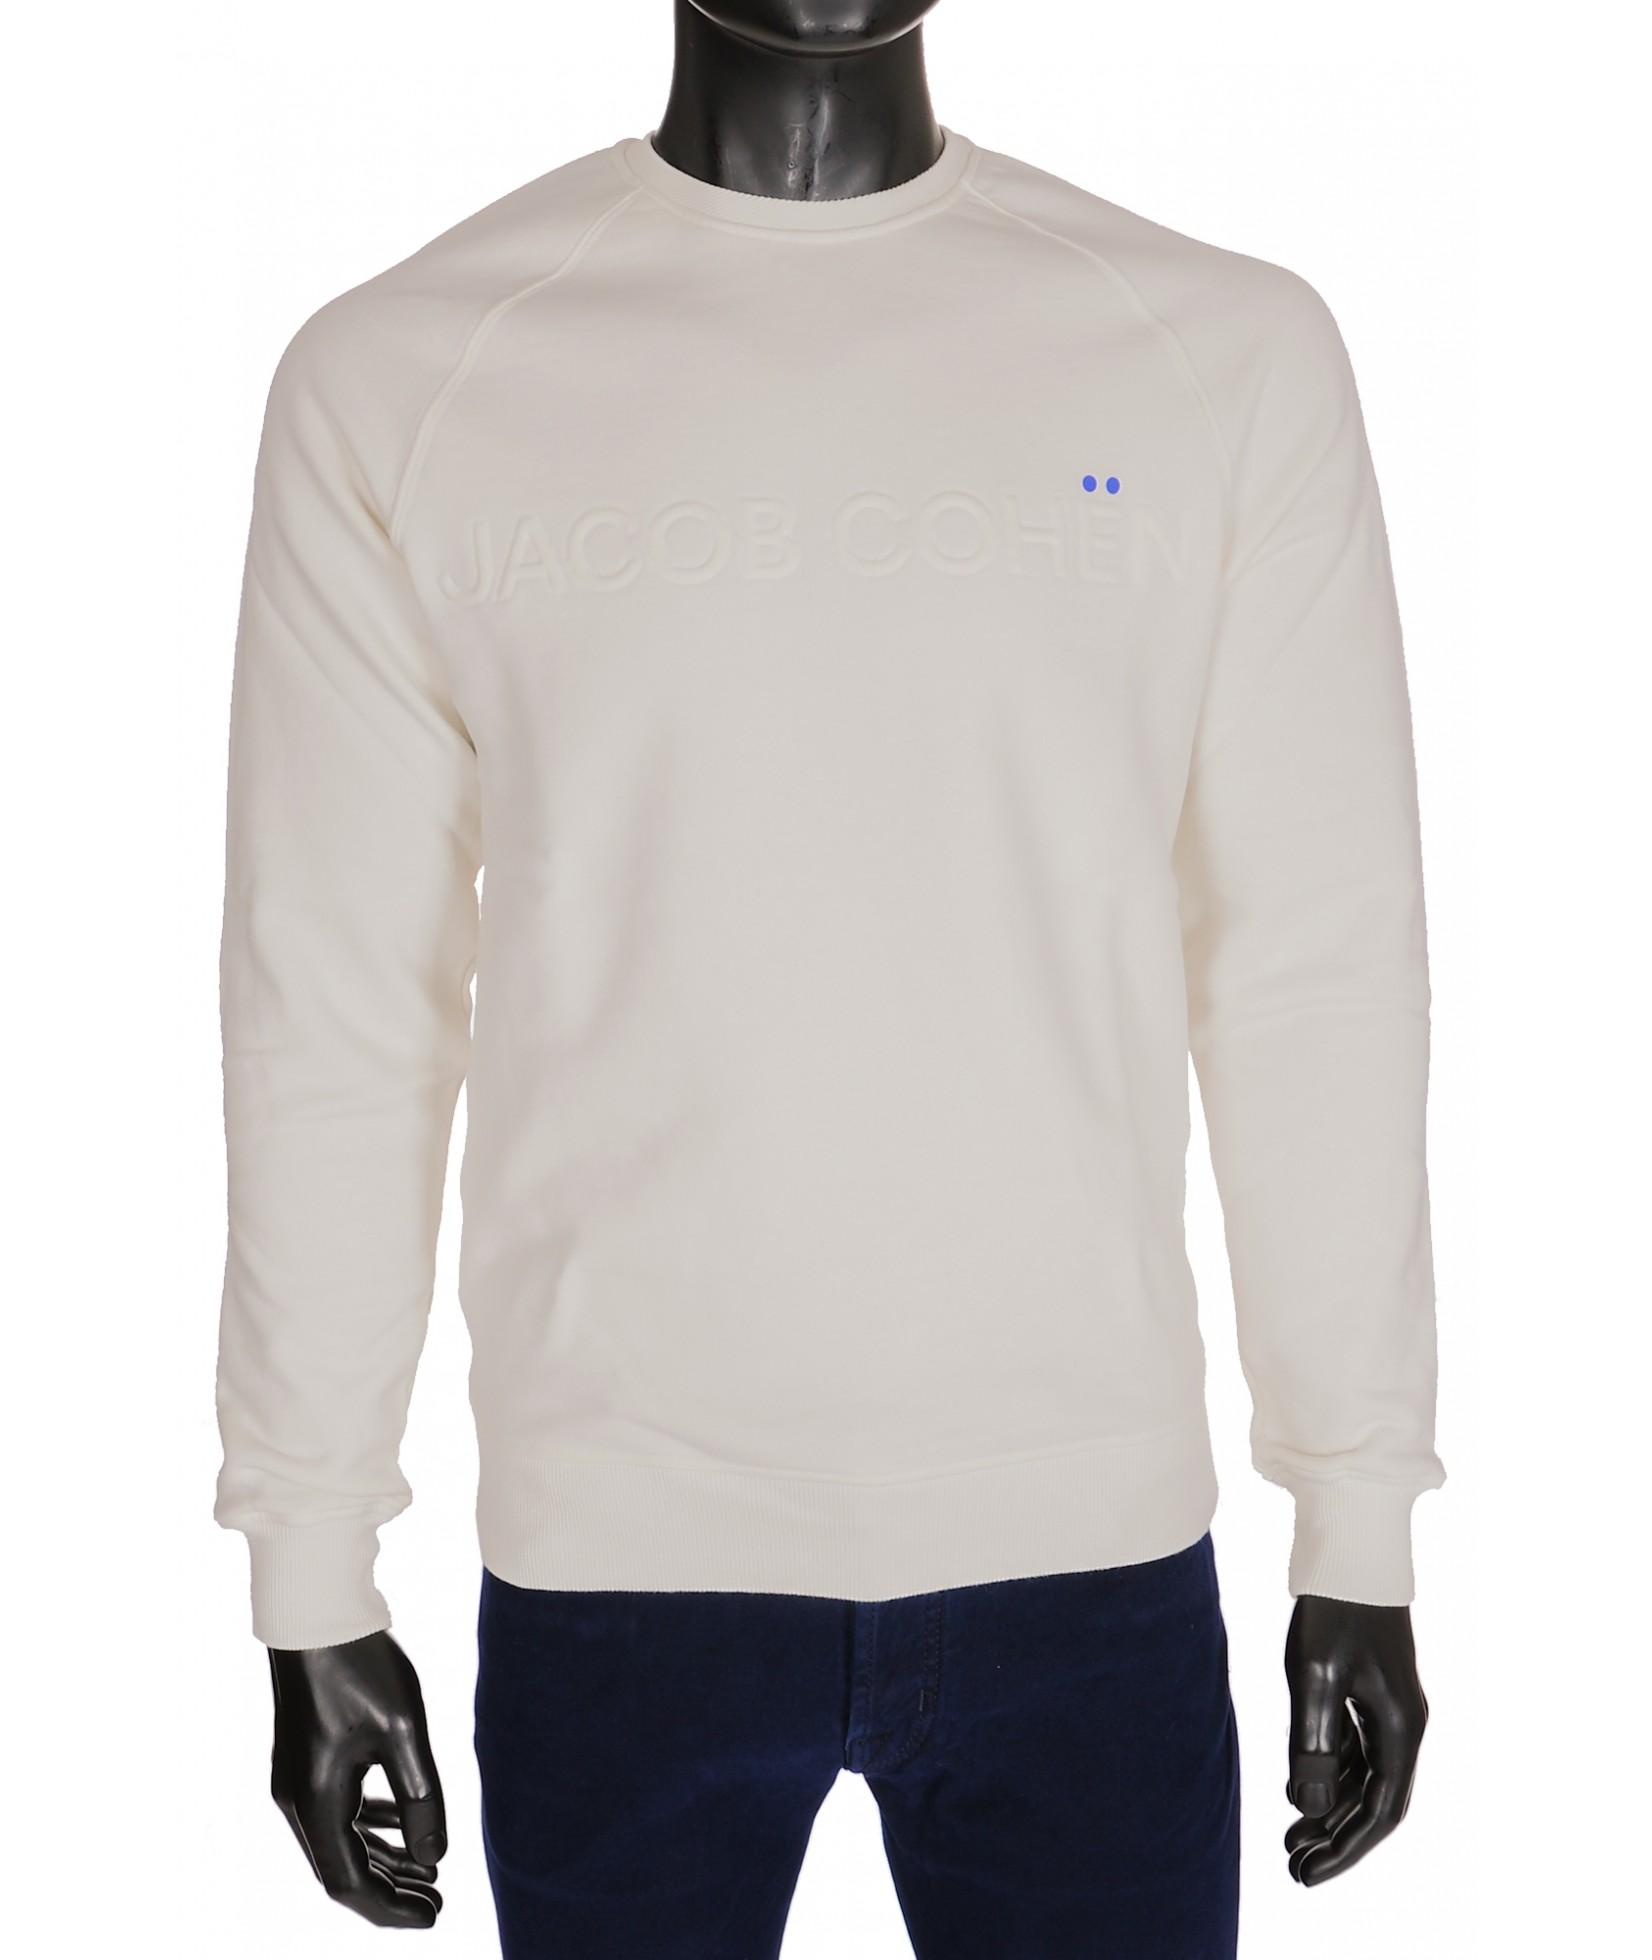 Jacob Cohen Sweater Wit Ivory (31434)